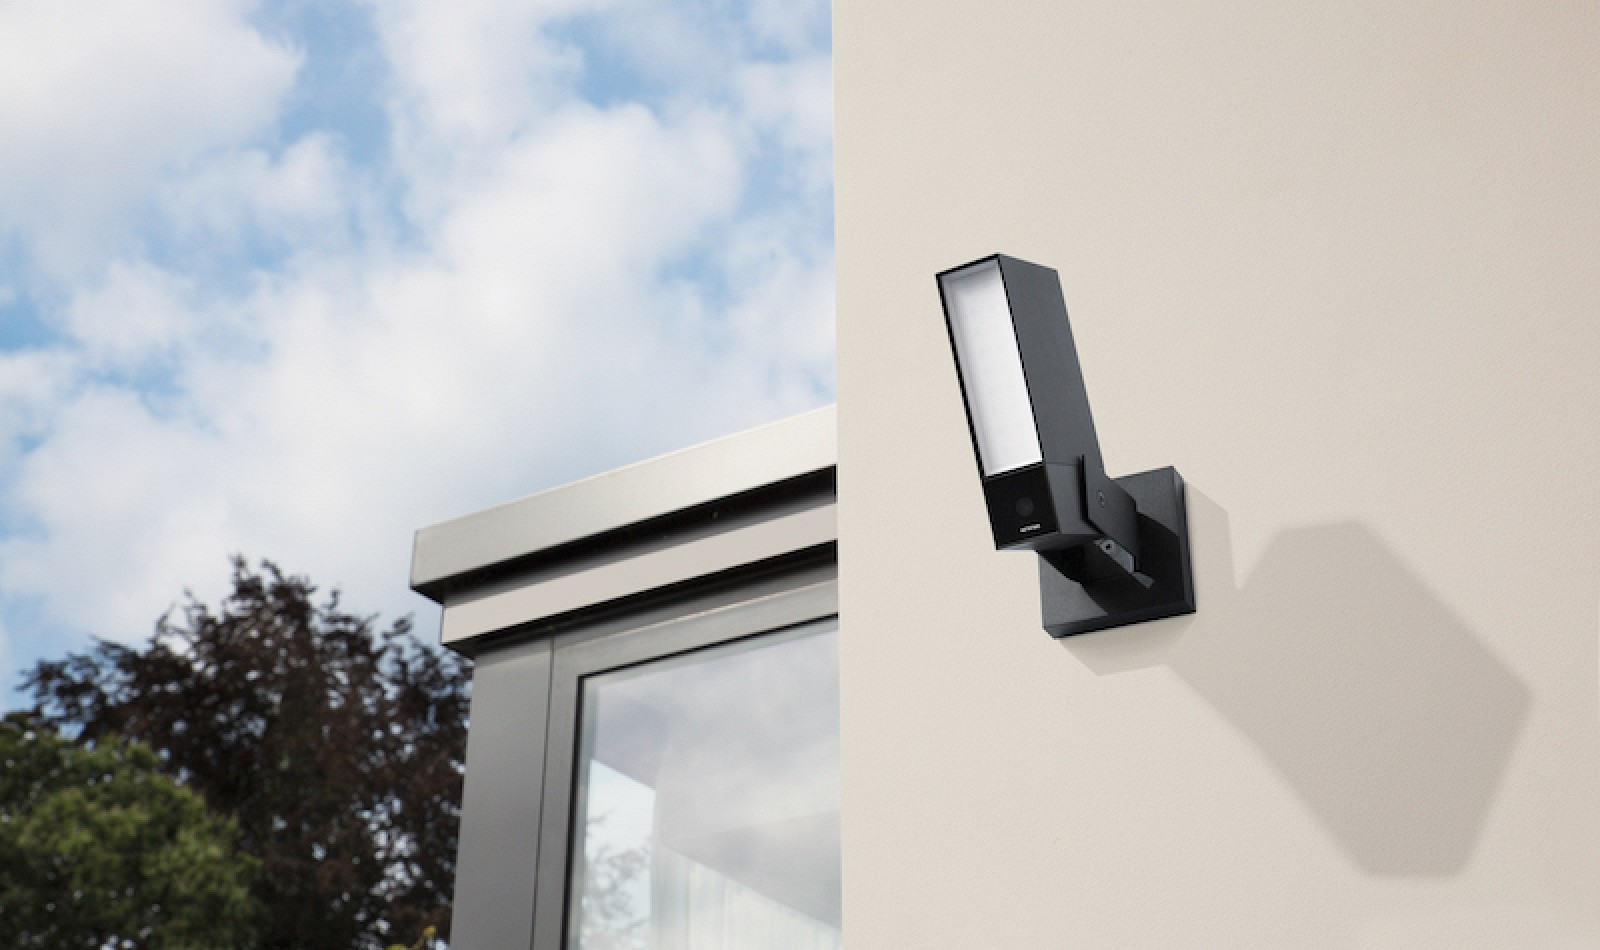 smart outdoor security camera 39 netatmo presence 39 now available mac rumors. Black Bedroom Furniture Sets. Home Design Ideas